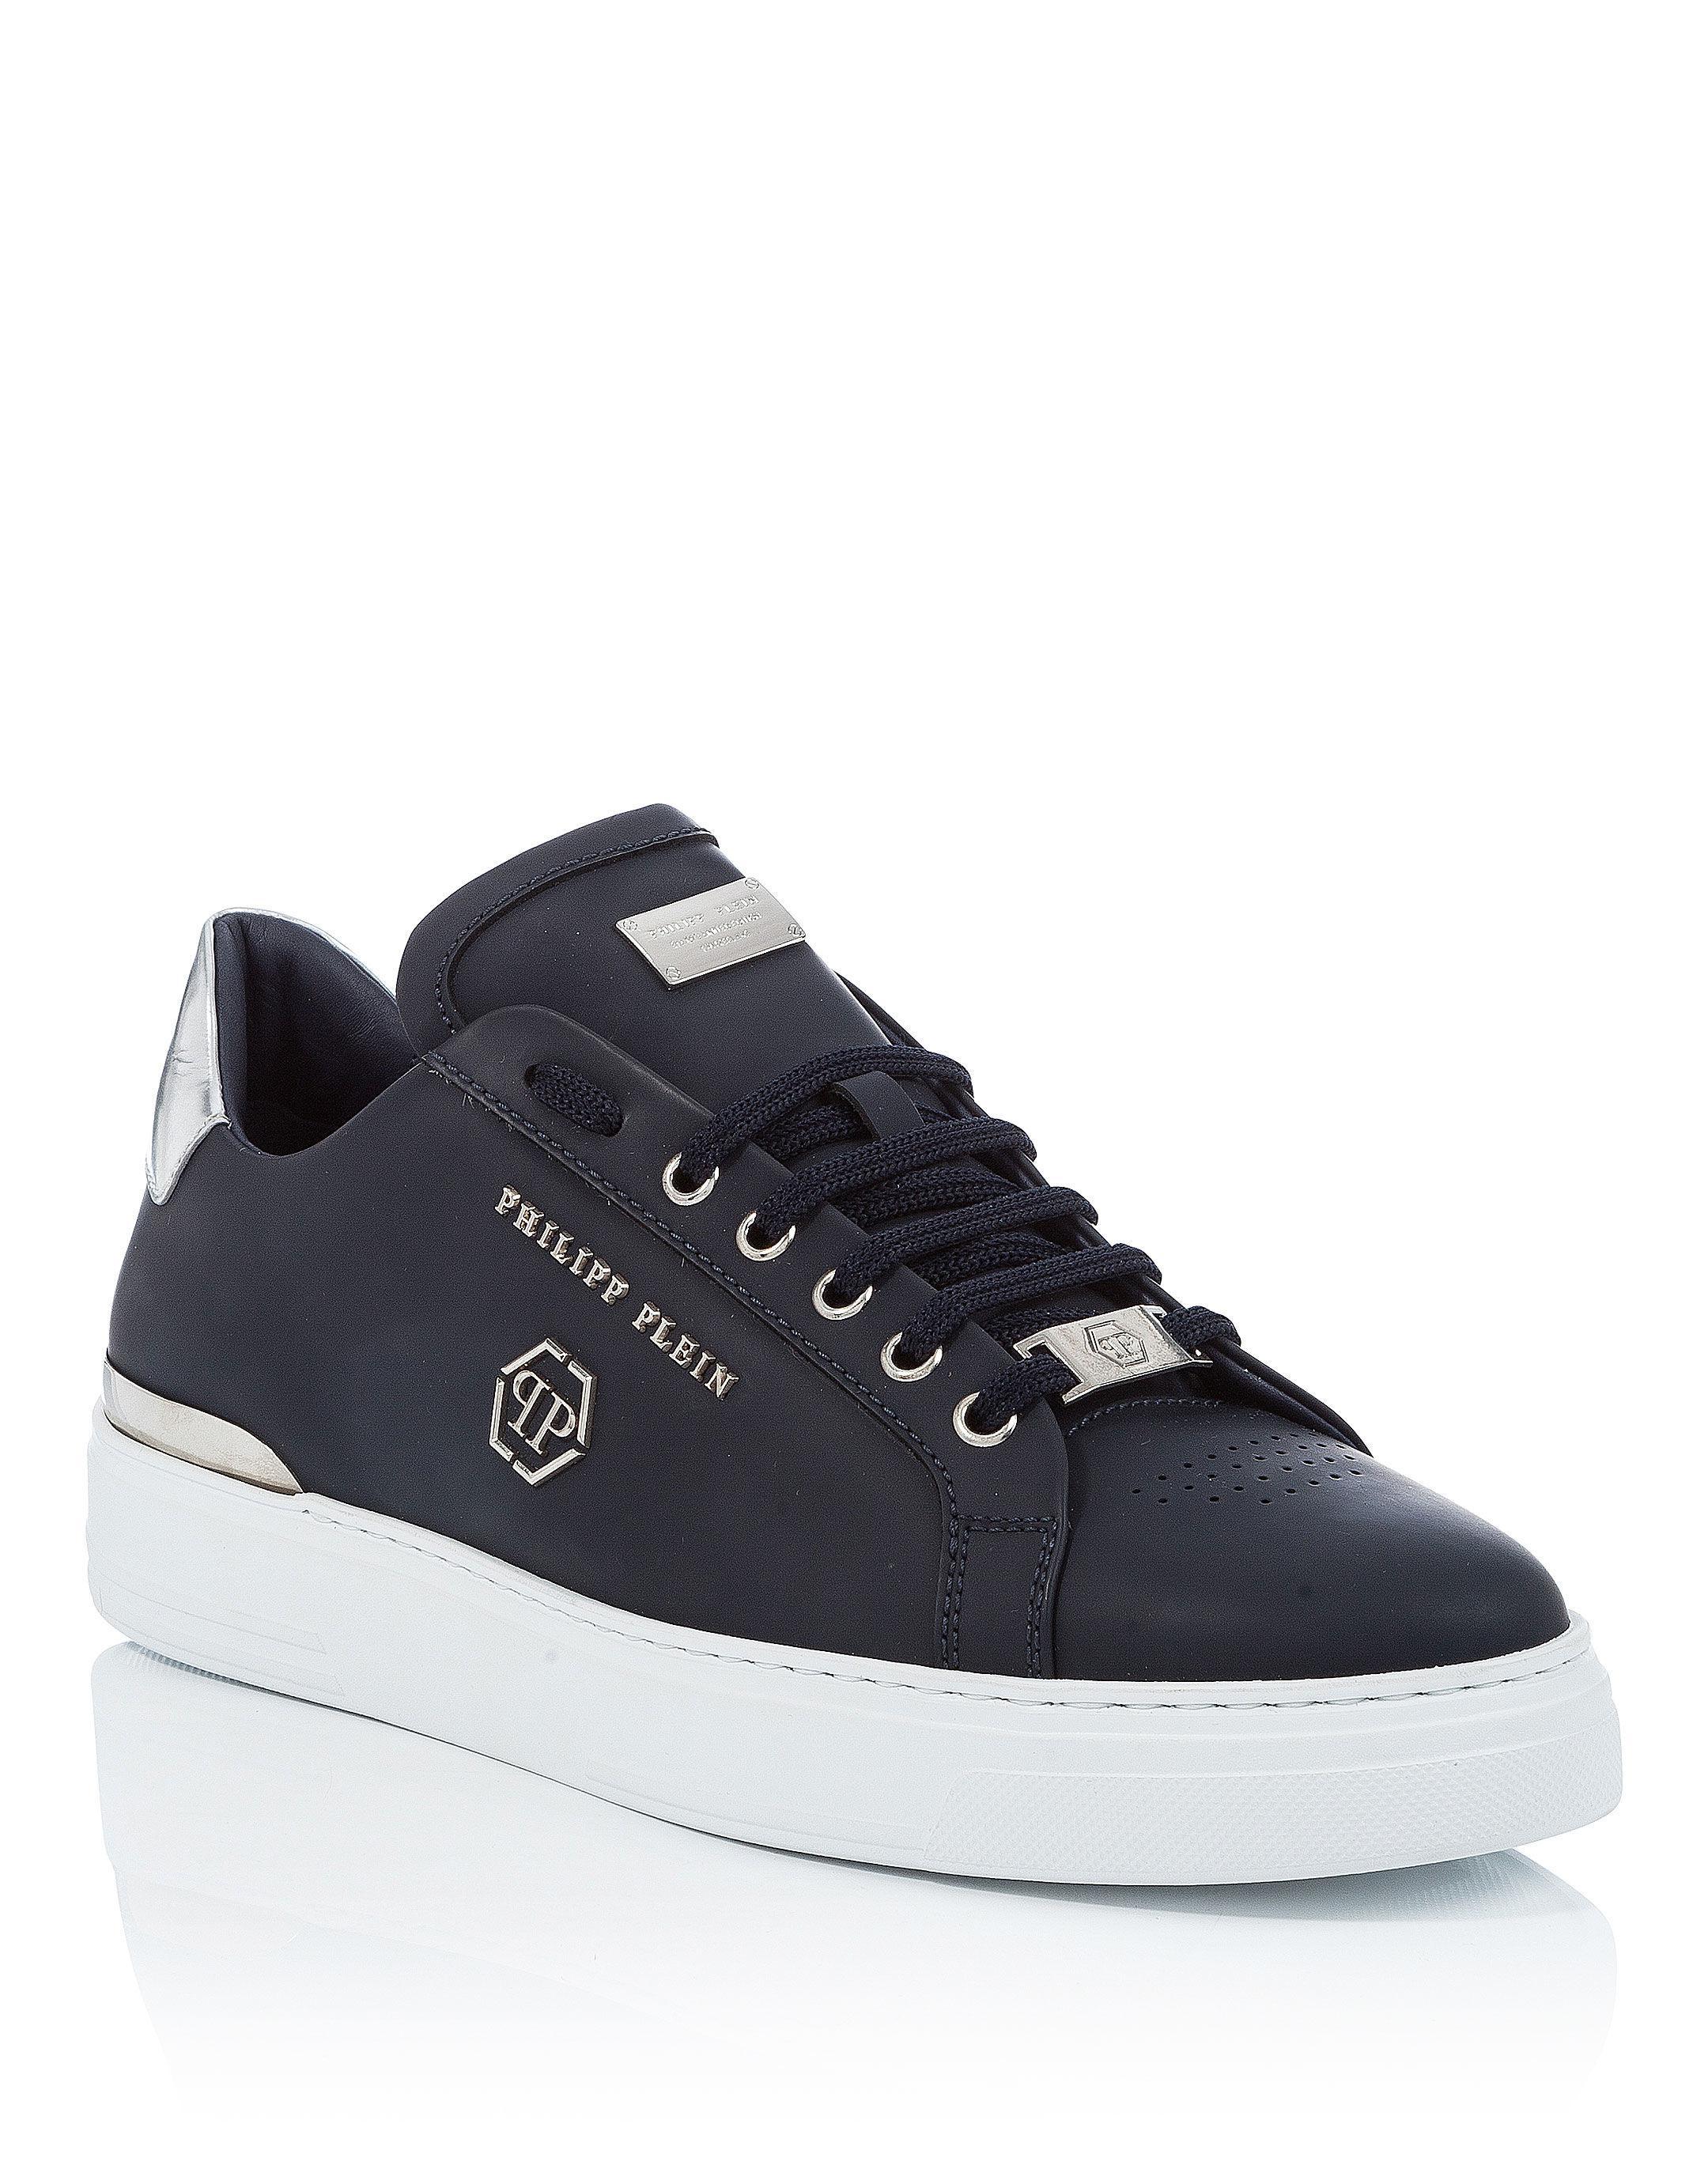 Over Border sneakers - Blue Philipp Plein Stockist Online Cost Online yz1ah4